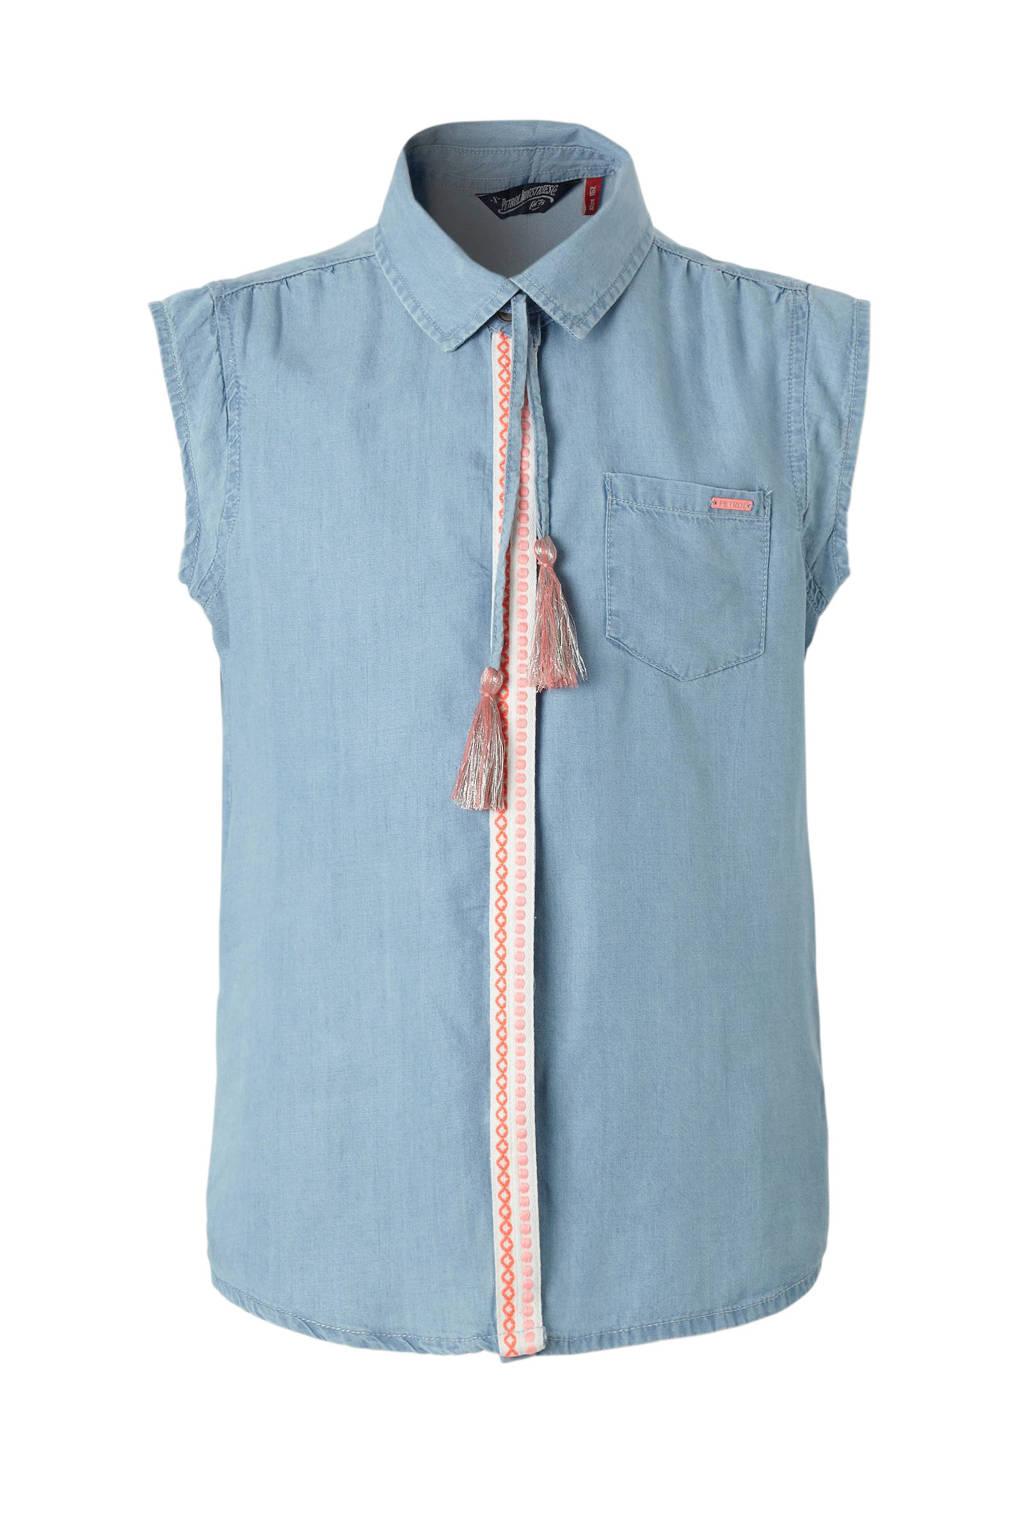 Petrol Industries mouwloze denim blouse met sierbies, Lichtblauw